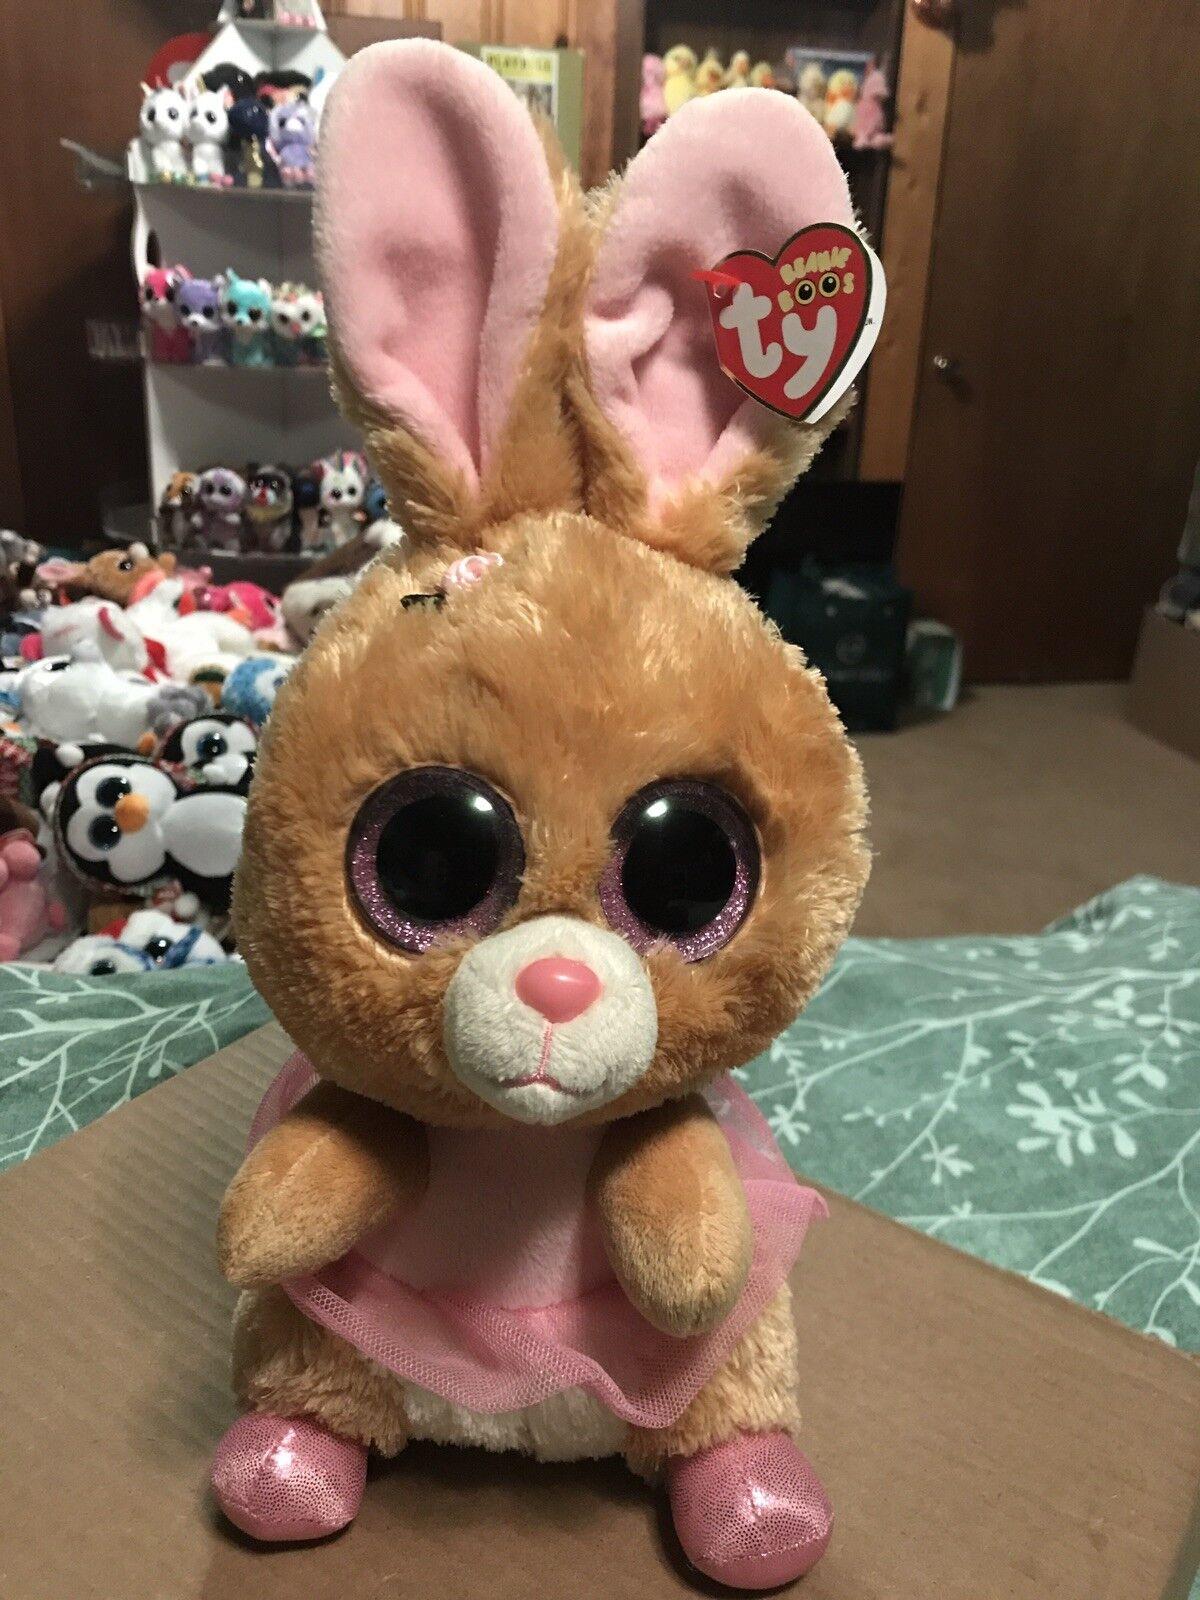 Ty trampeltier tan   Rosa rabbit beanie - kumpel  ruhestand ballerina  selten & vhtf